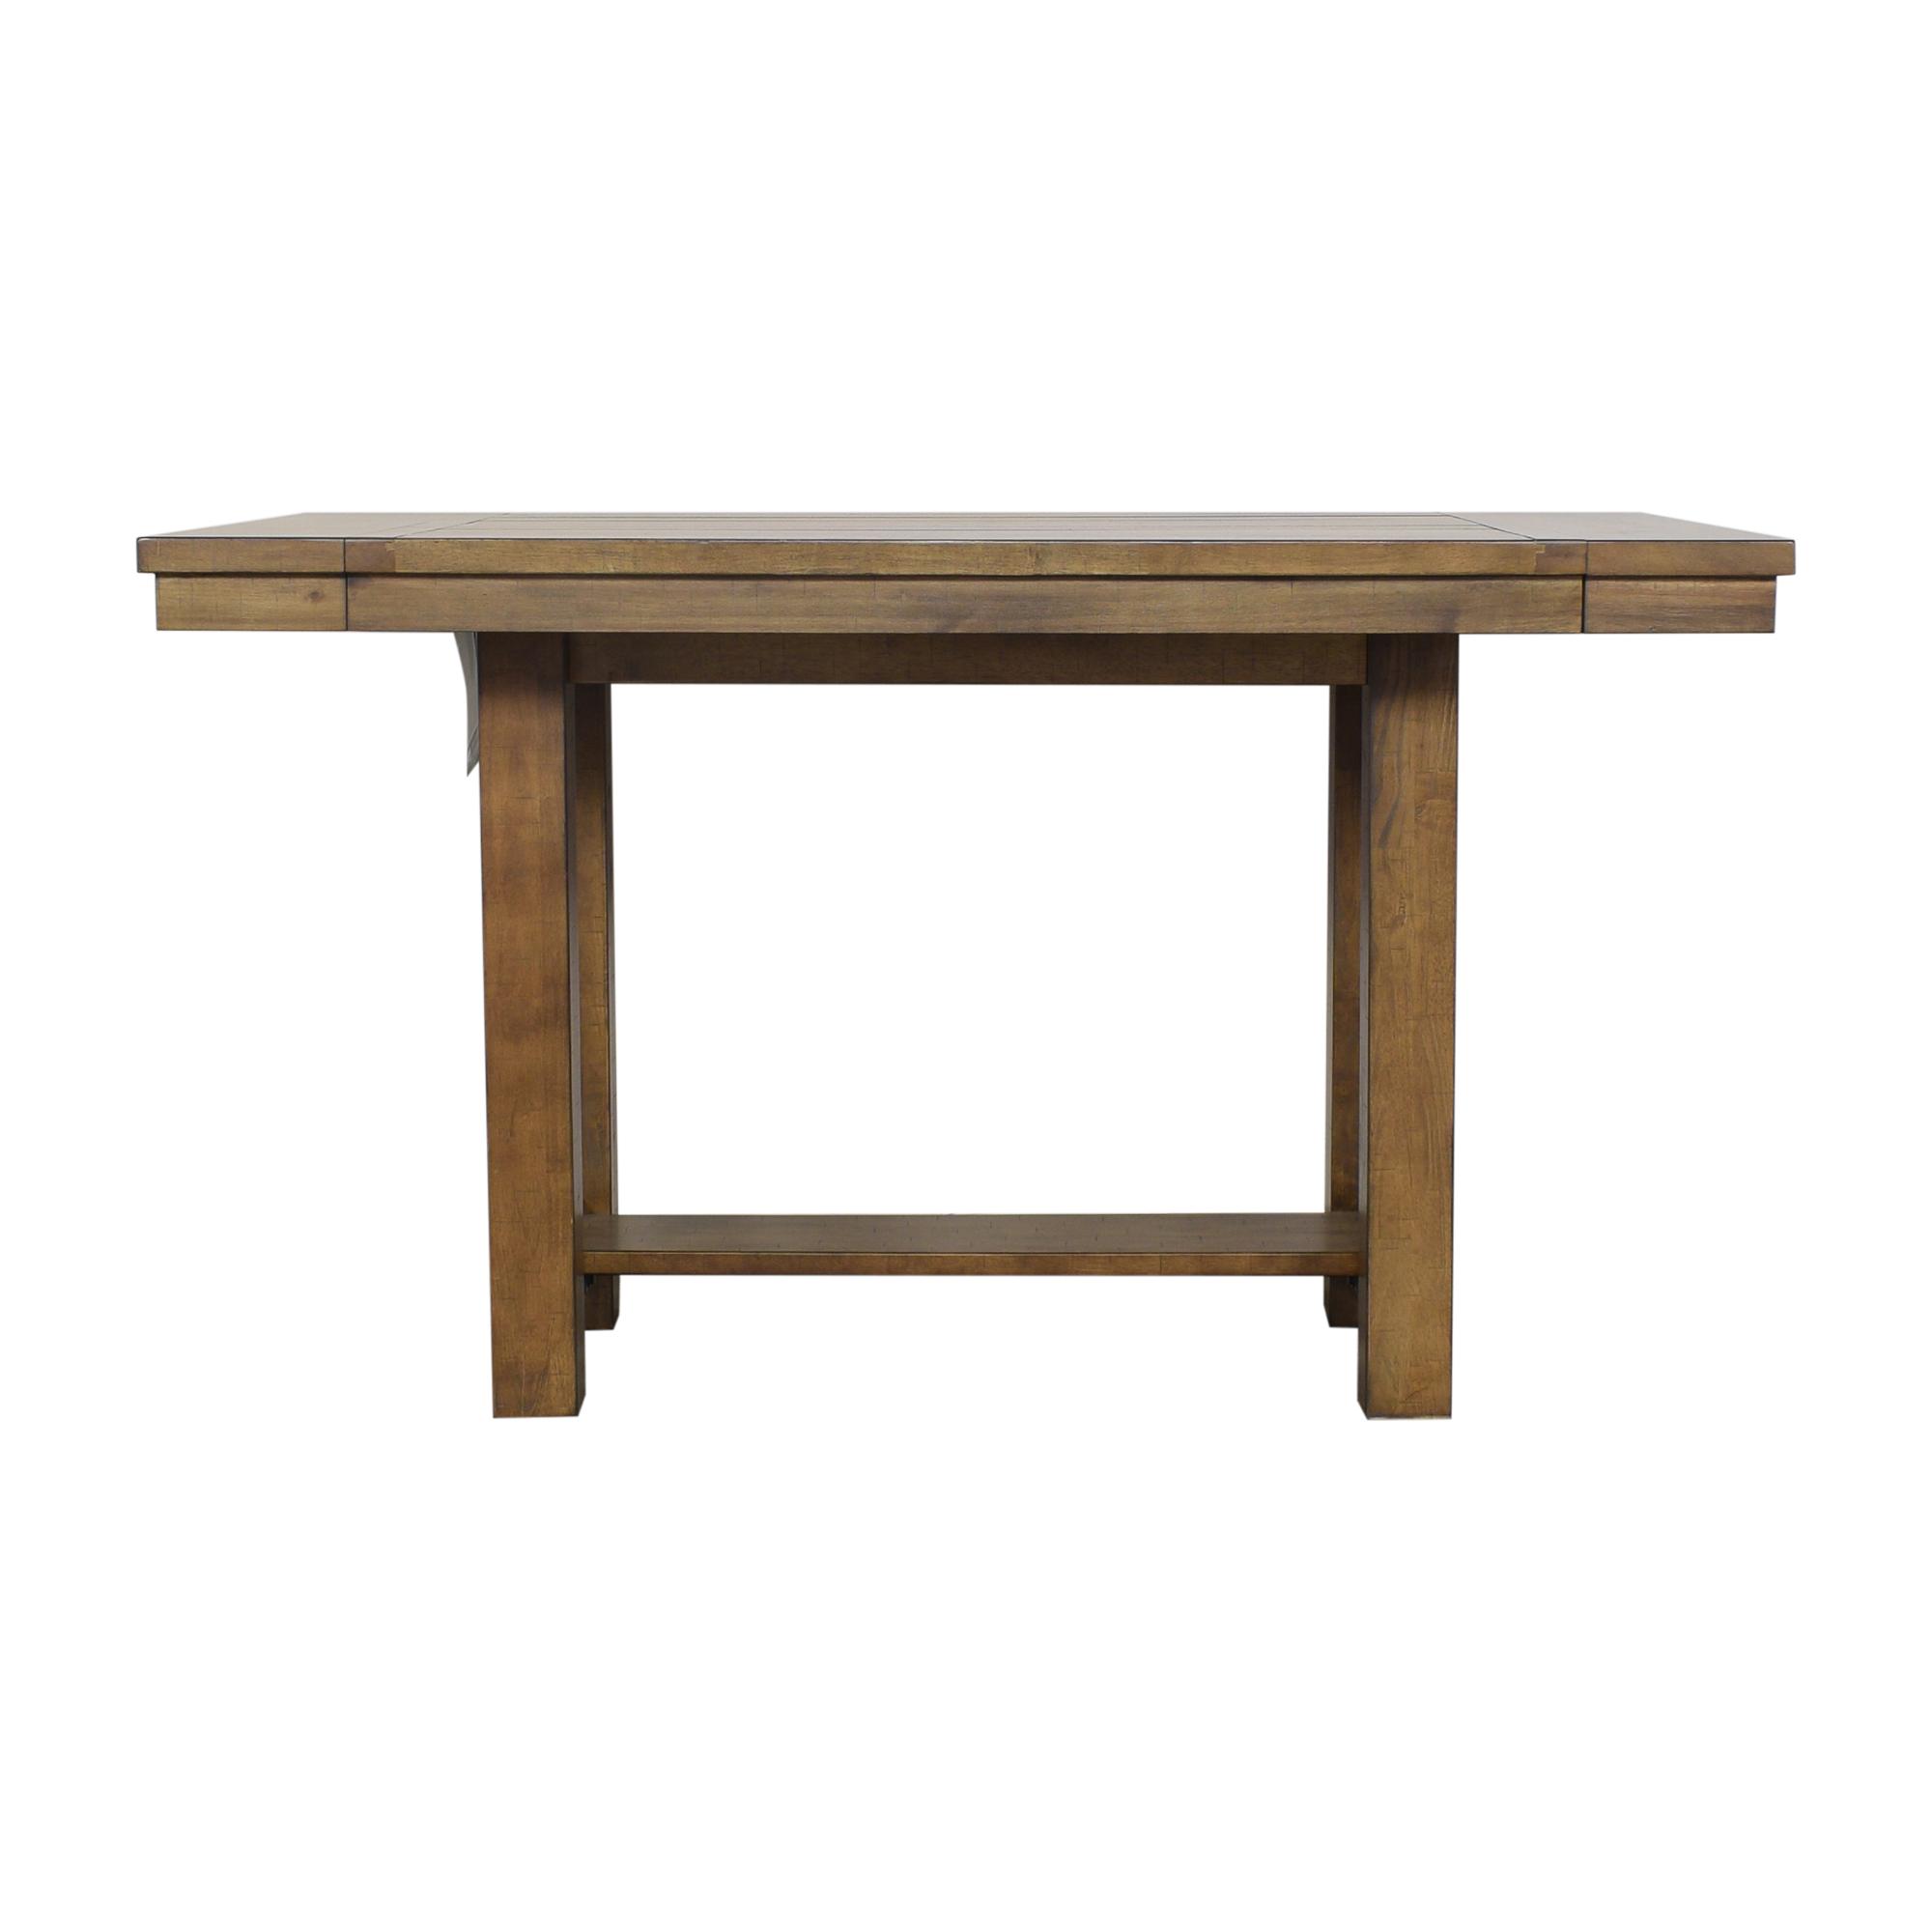 Ashley Furniture Ashley Furniture Moriville Counter Extension Table ma